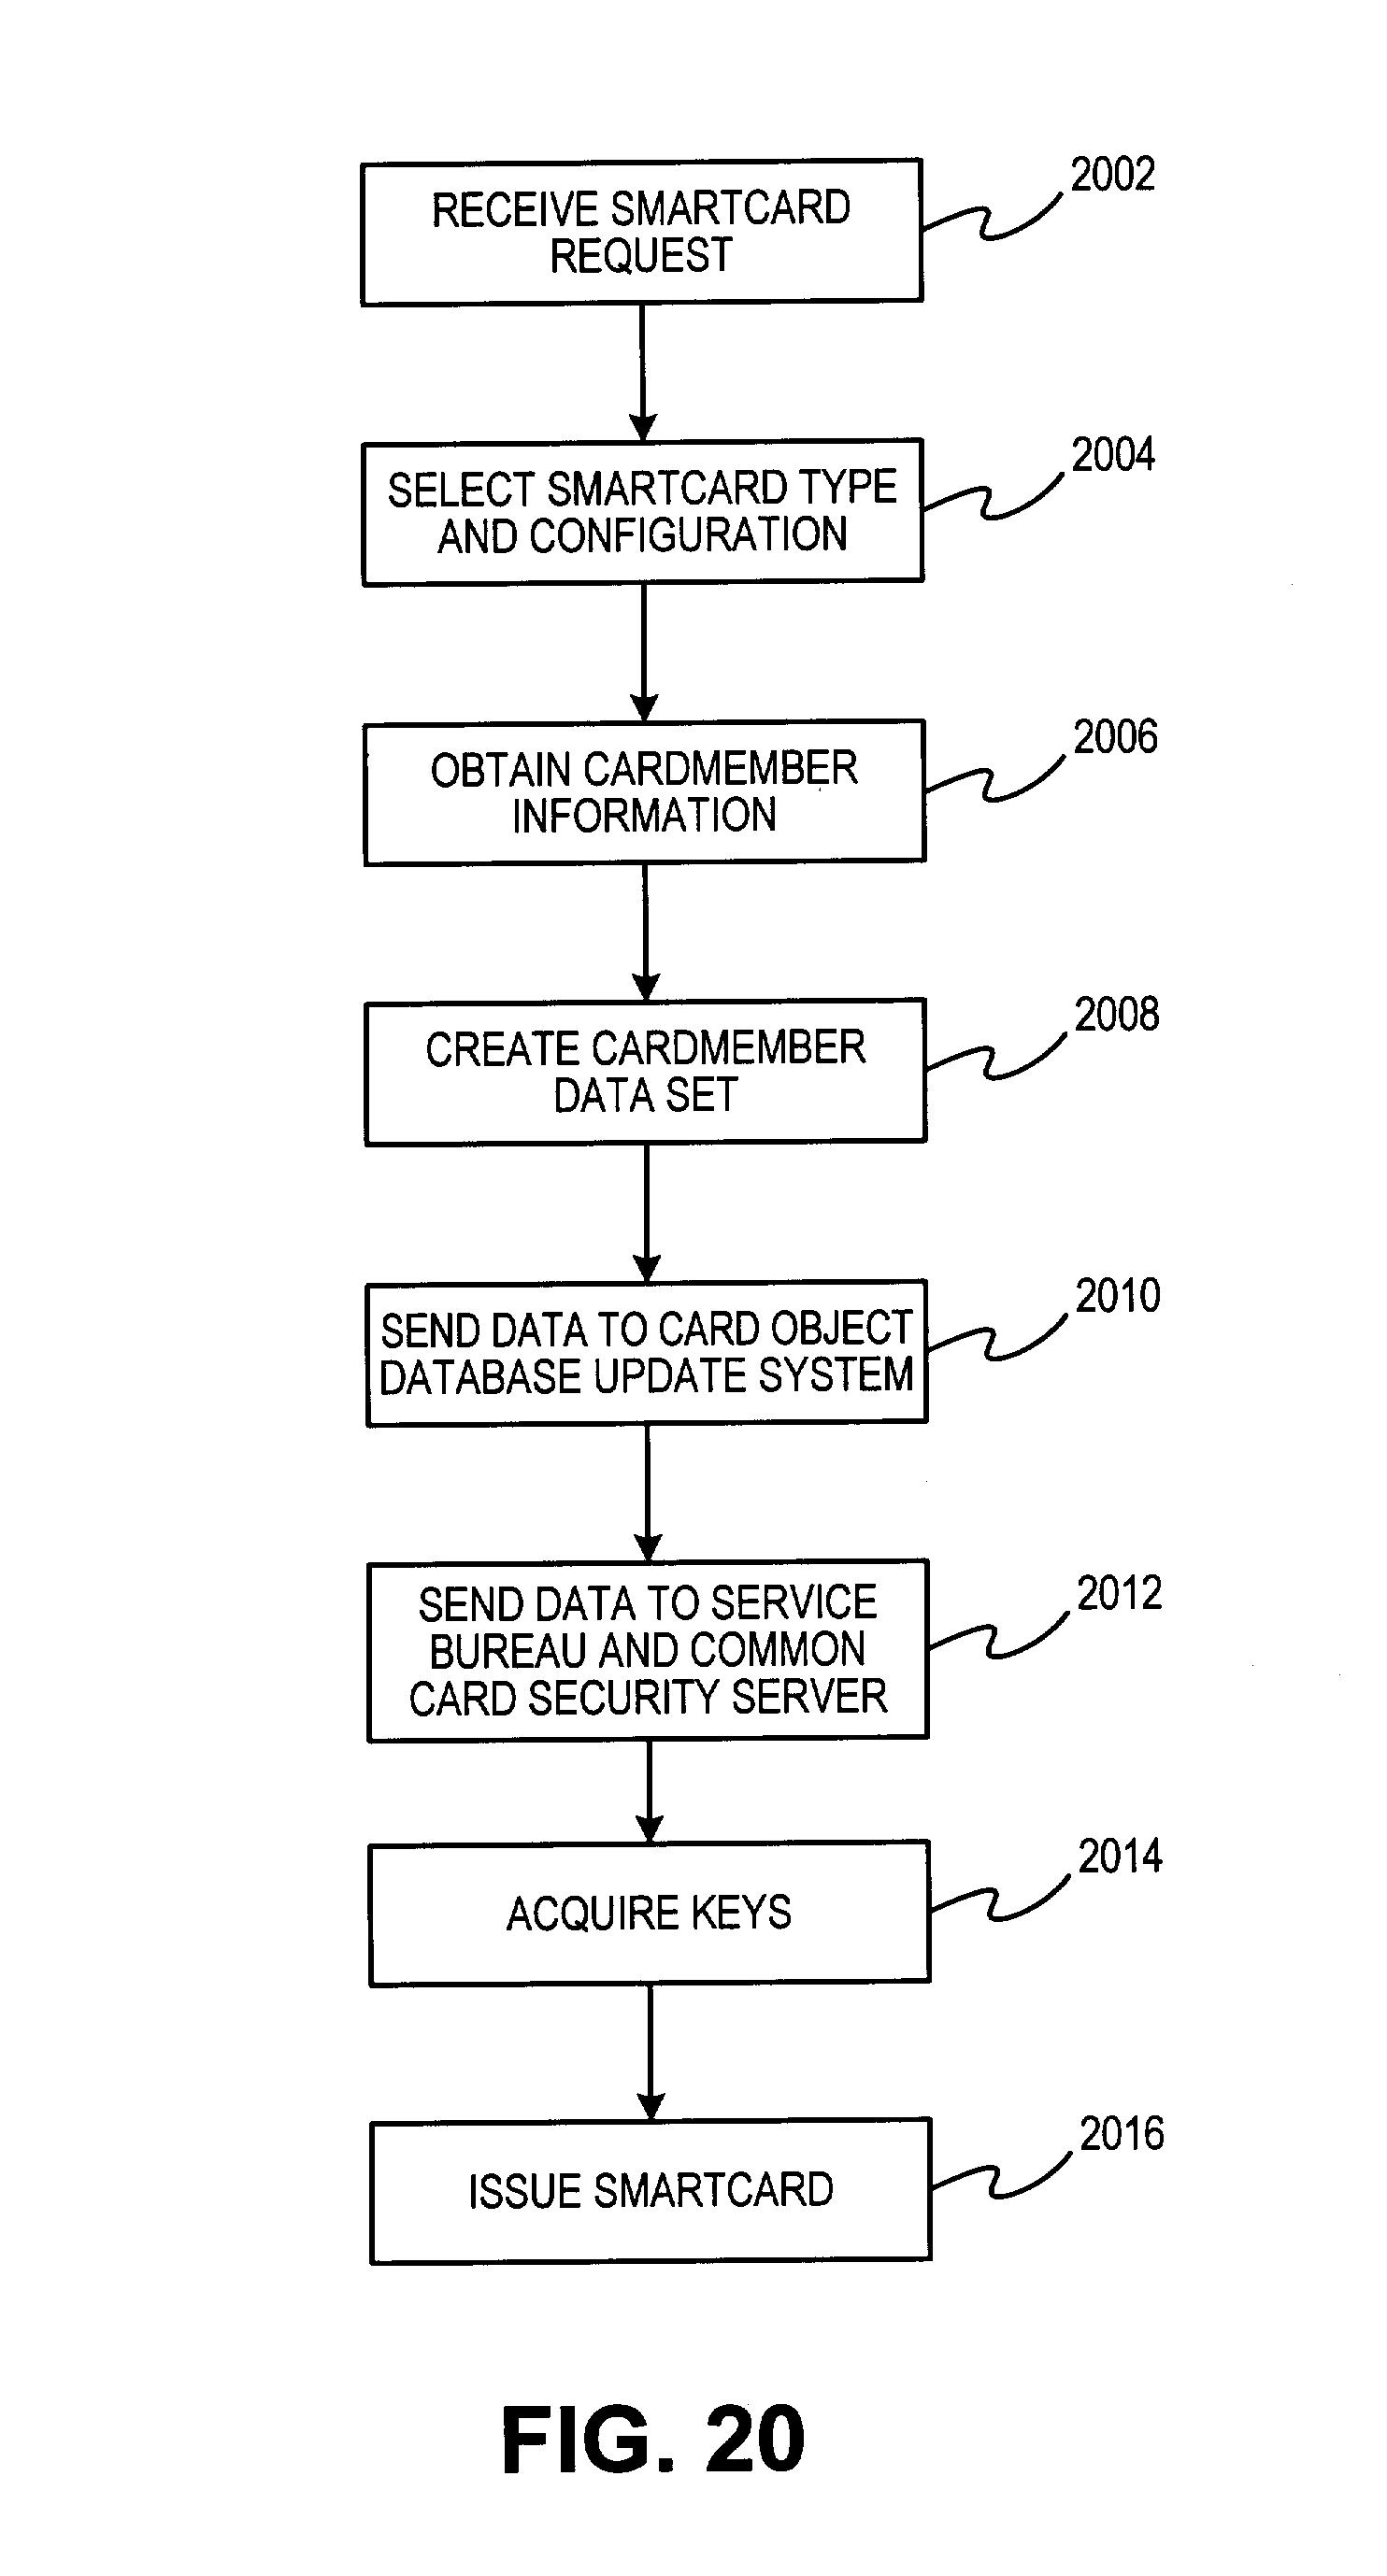 Patent US 7,314,164 B2